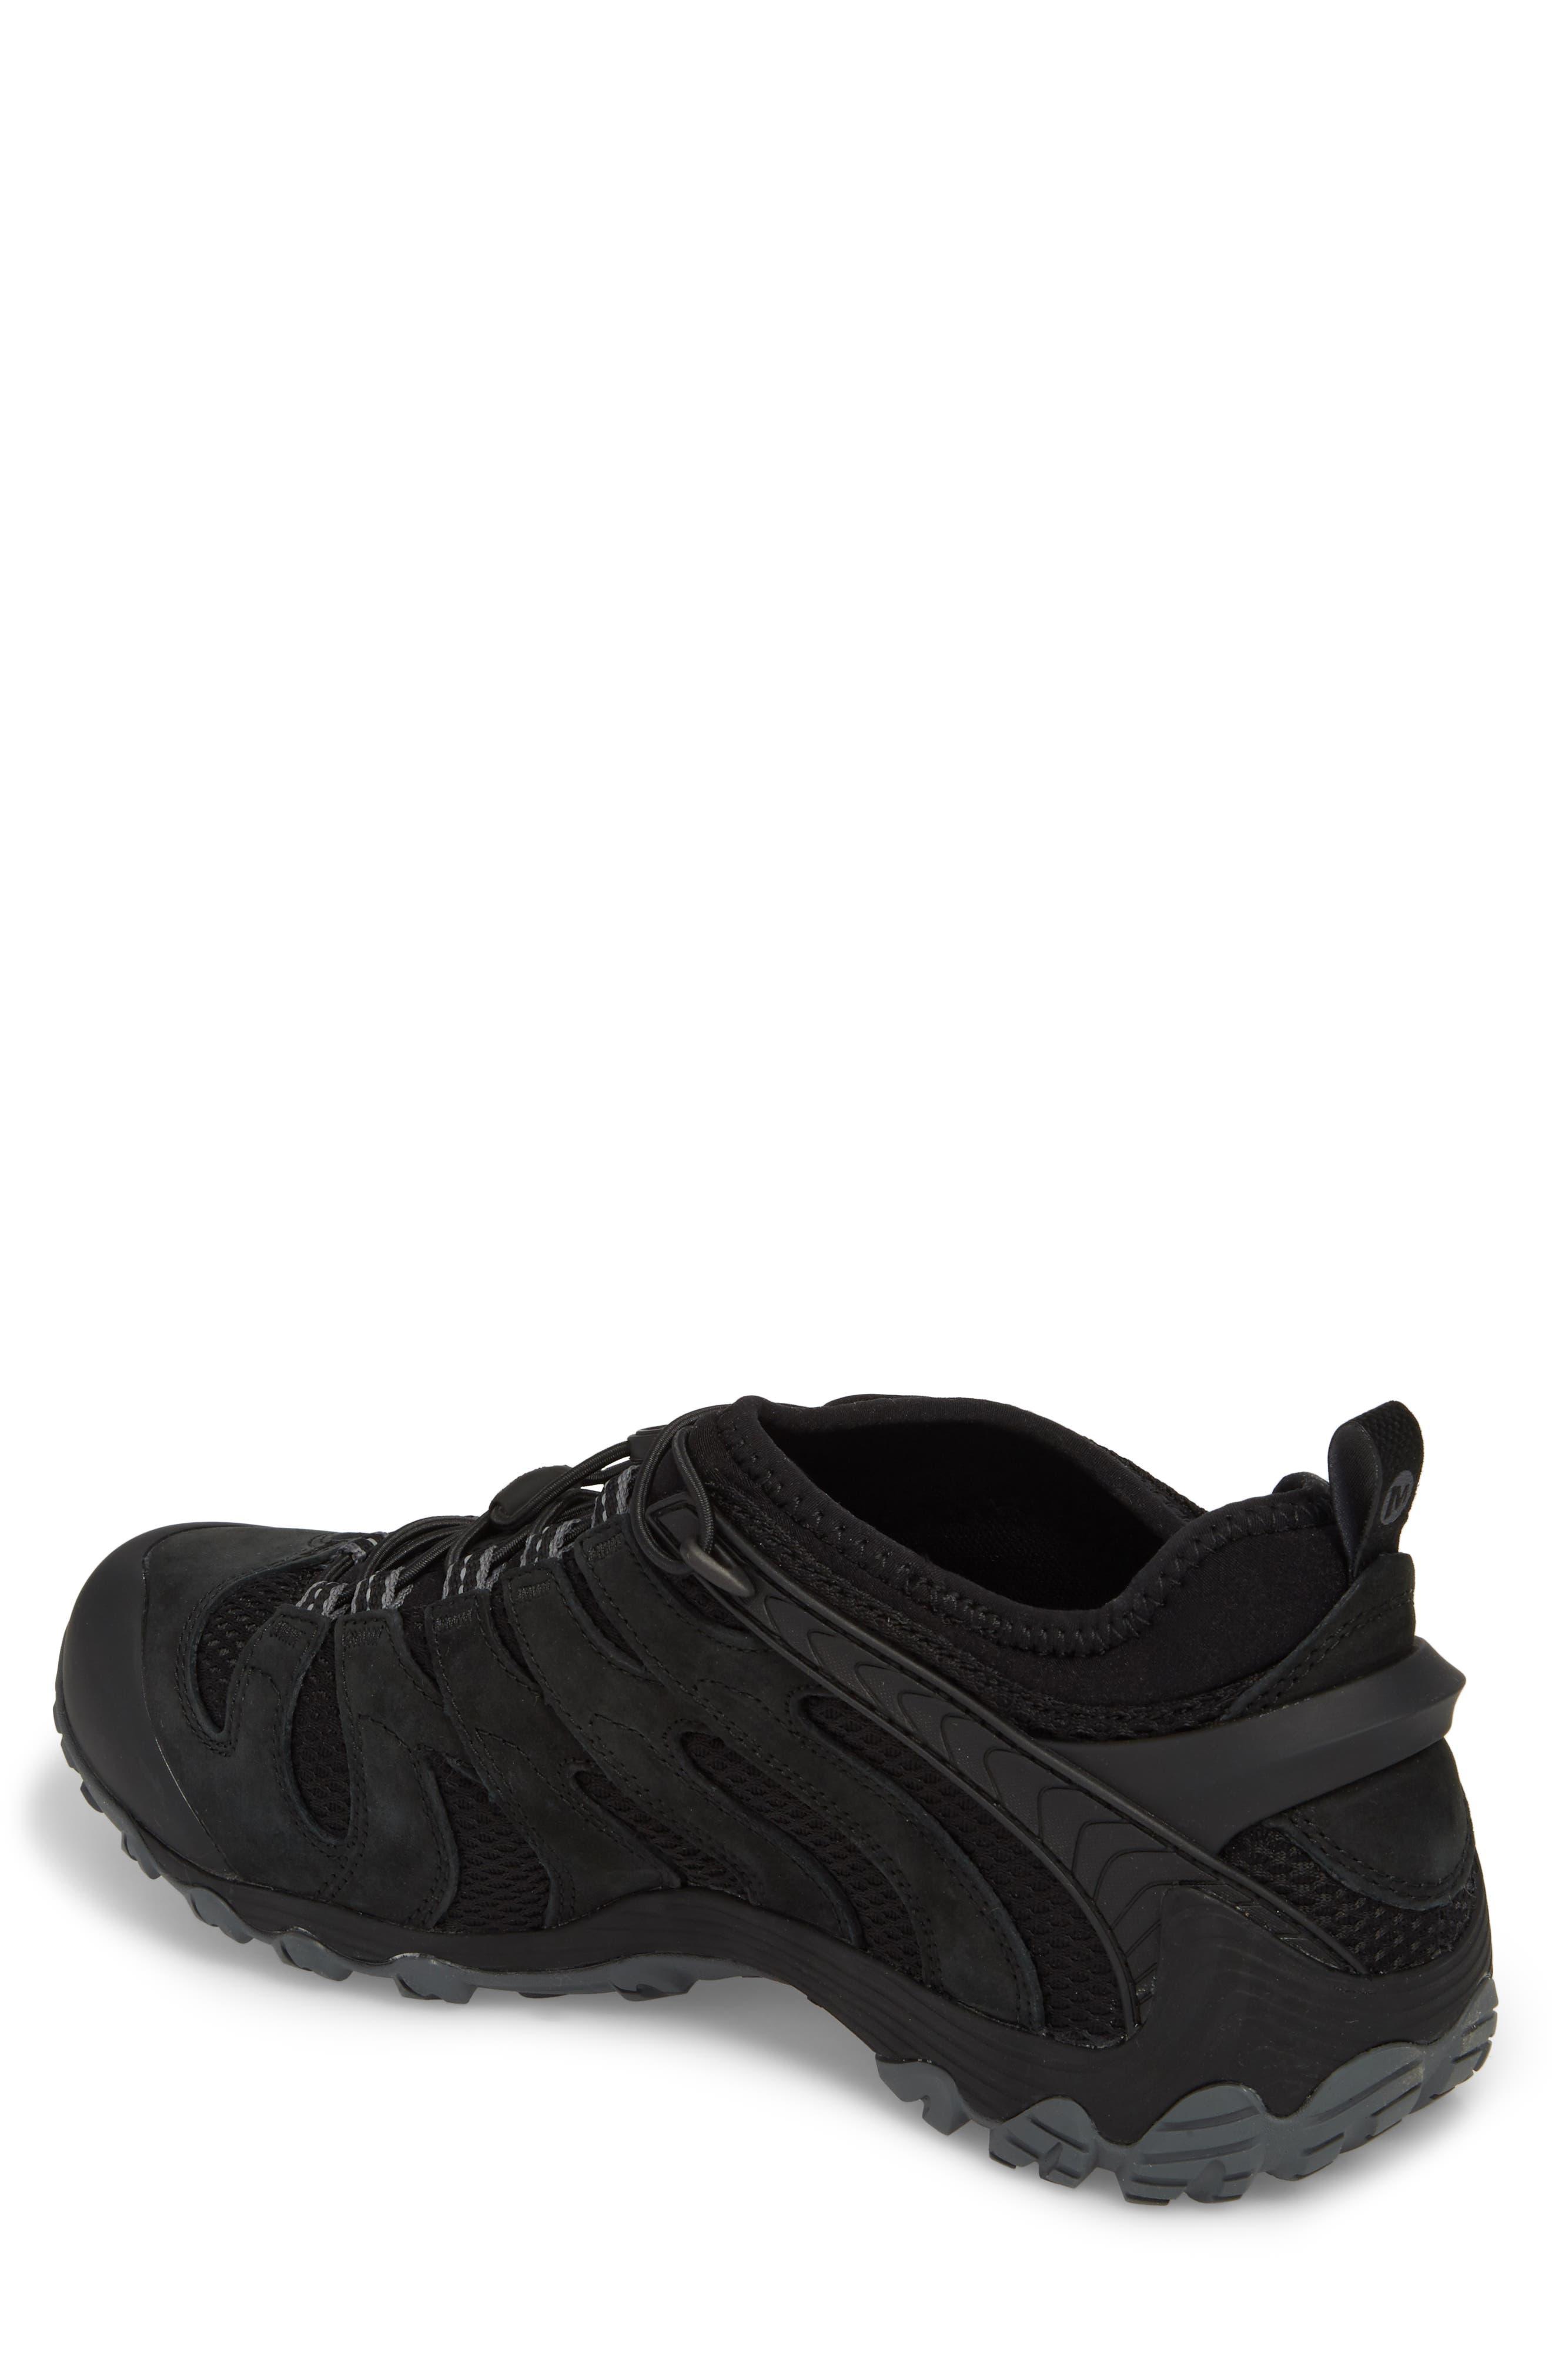 MERRELL, Chameleon 7 Stretch Hiking Shoe, Alternate thumbnail 2, color, BLACK